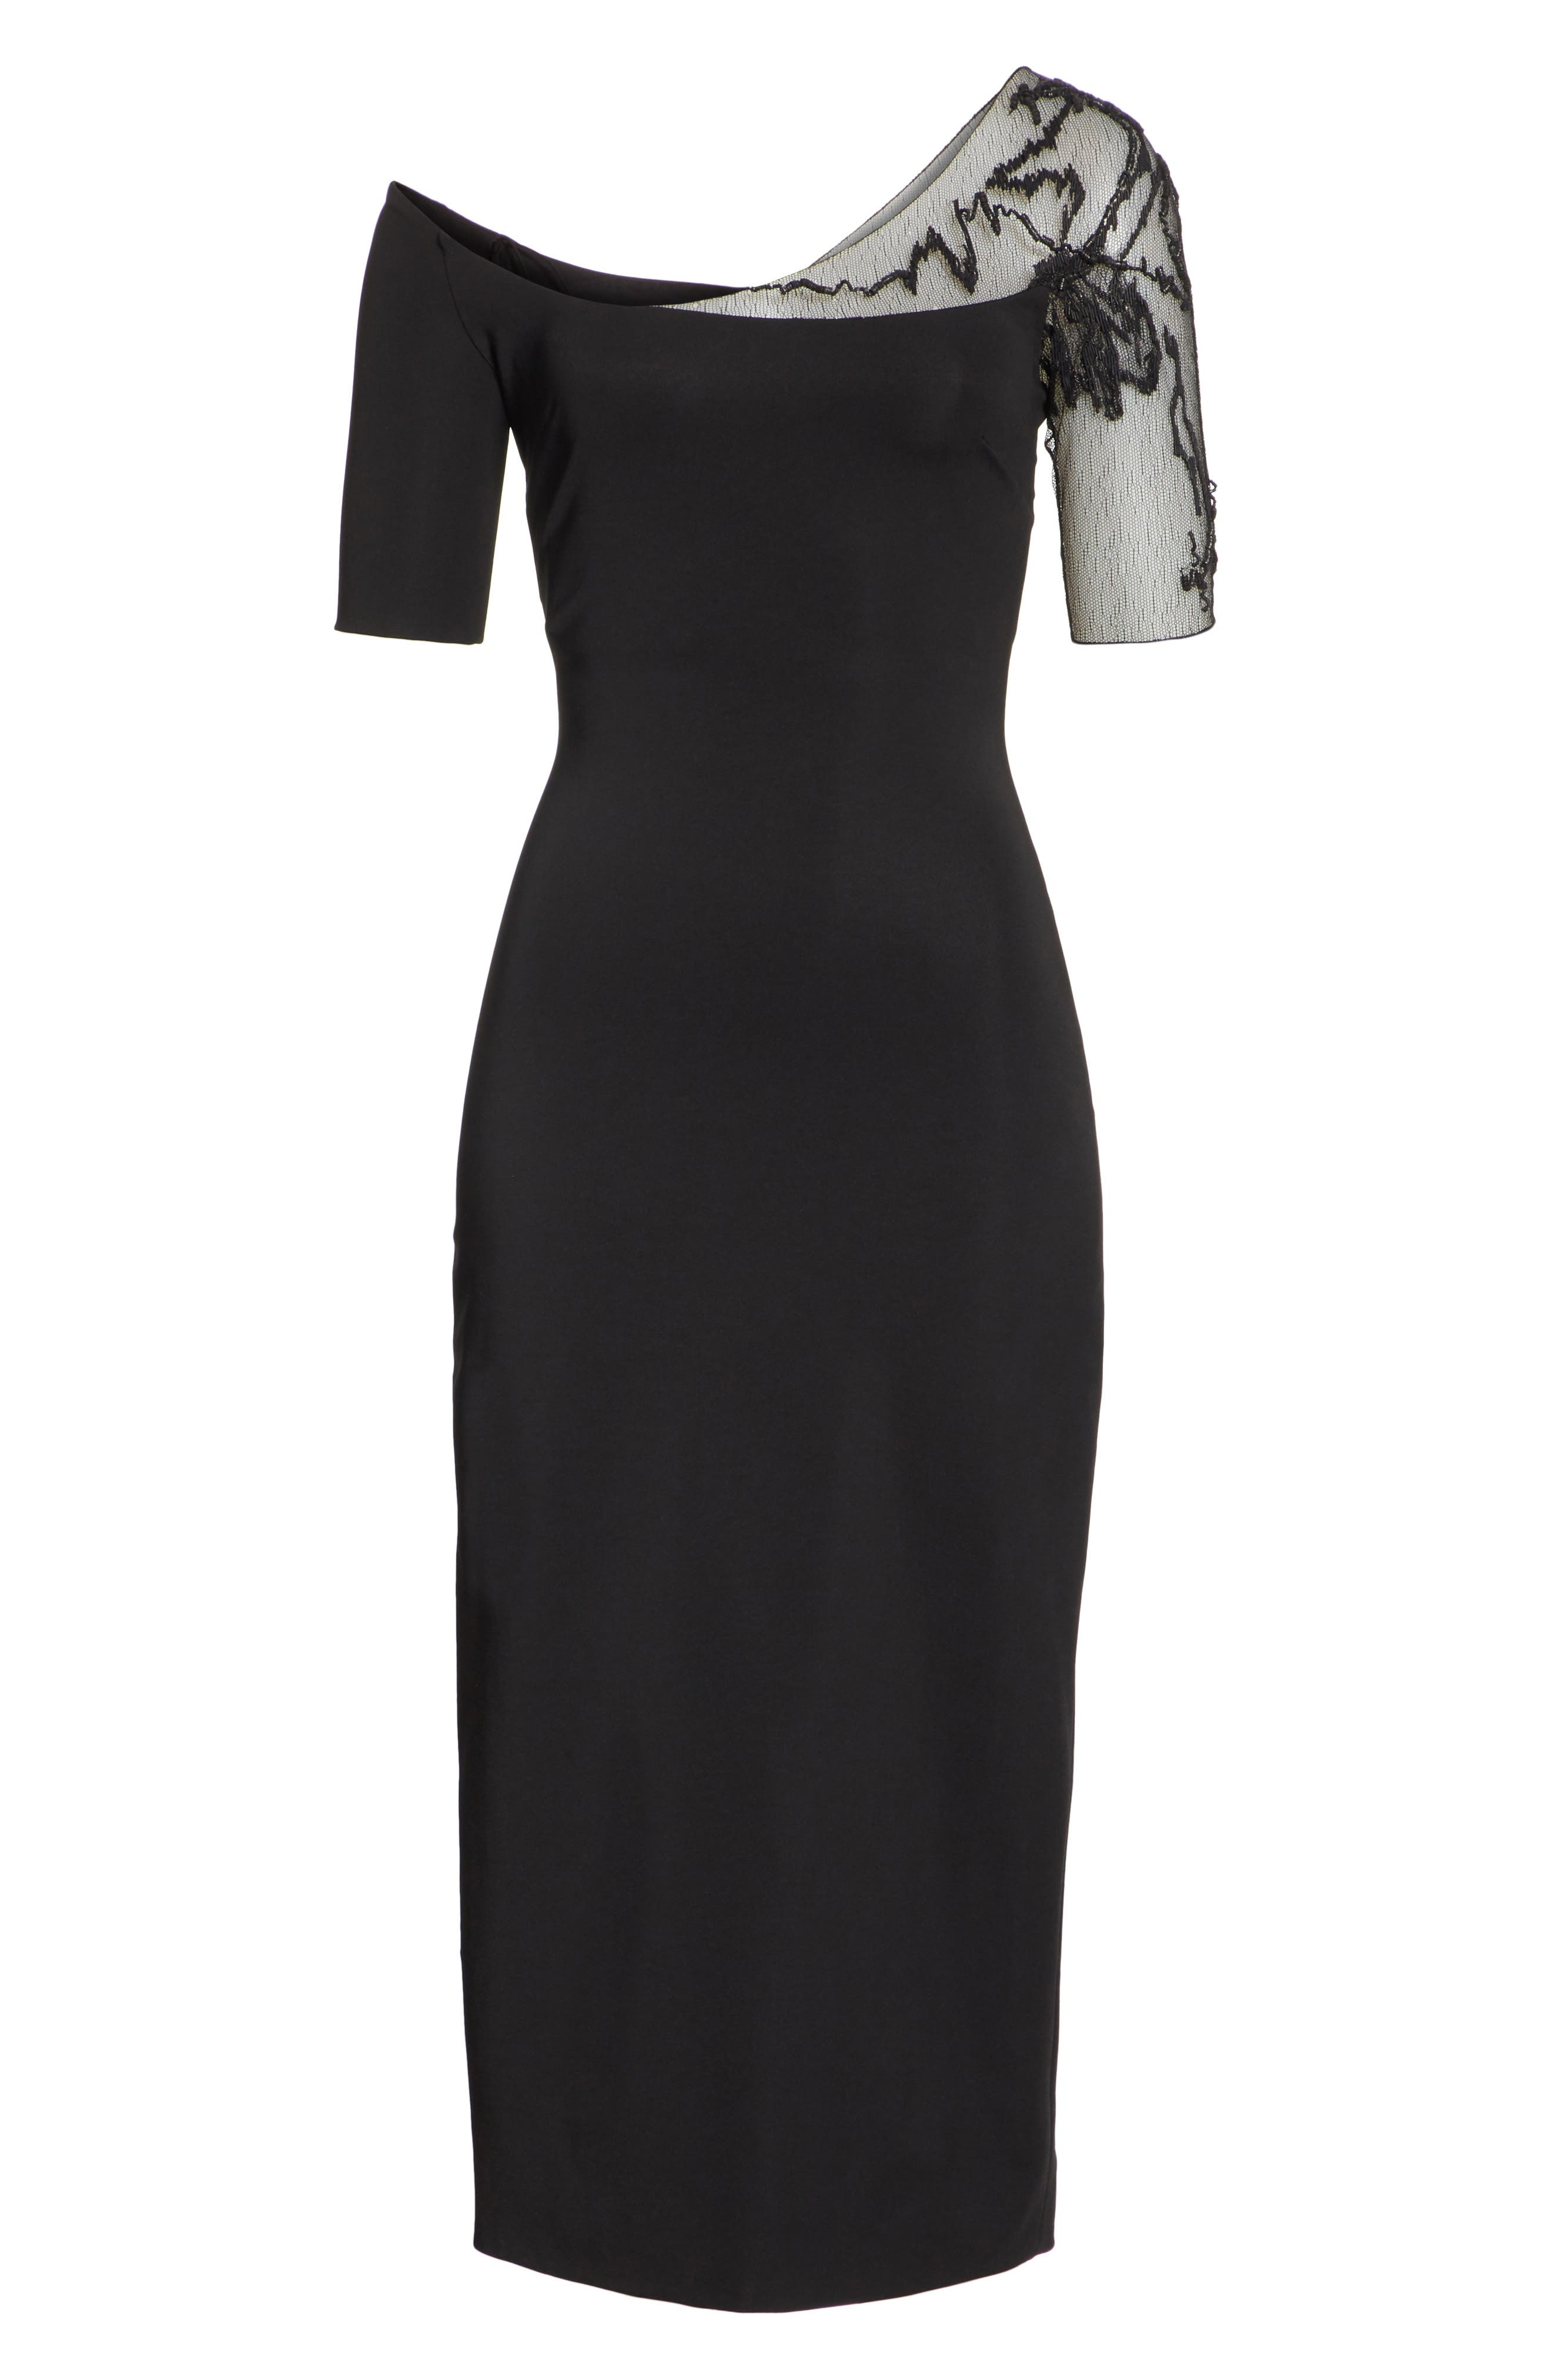 CUSHNIE,                             et Ochs Embellished Mesh One-Shoulder Sheath Dress,                             Alternate thumbnail 6, color,                             001